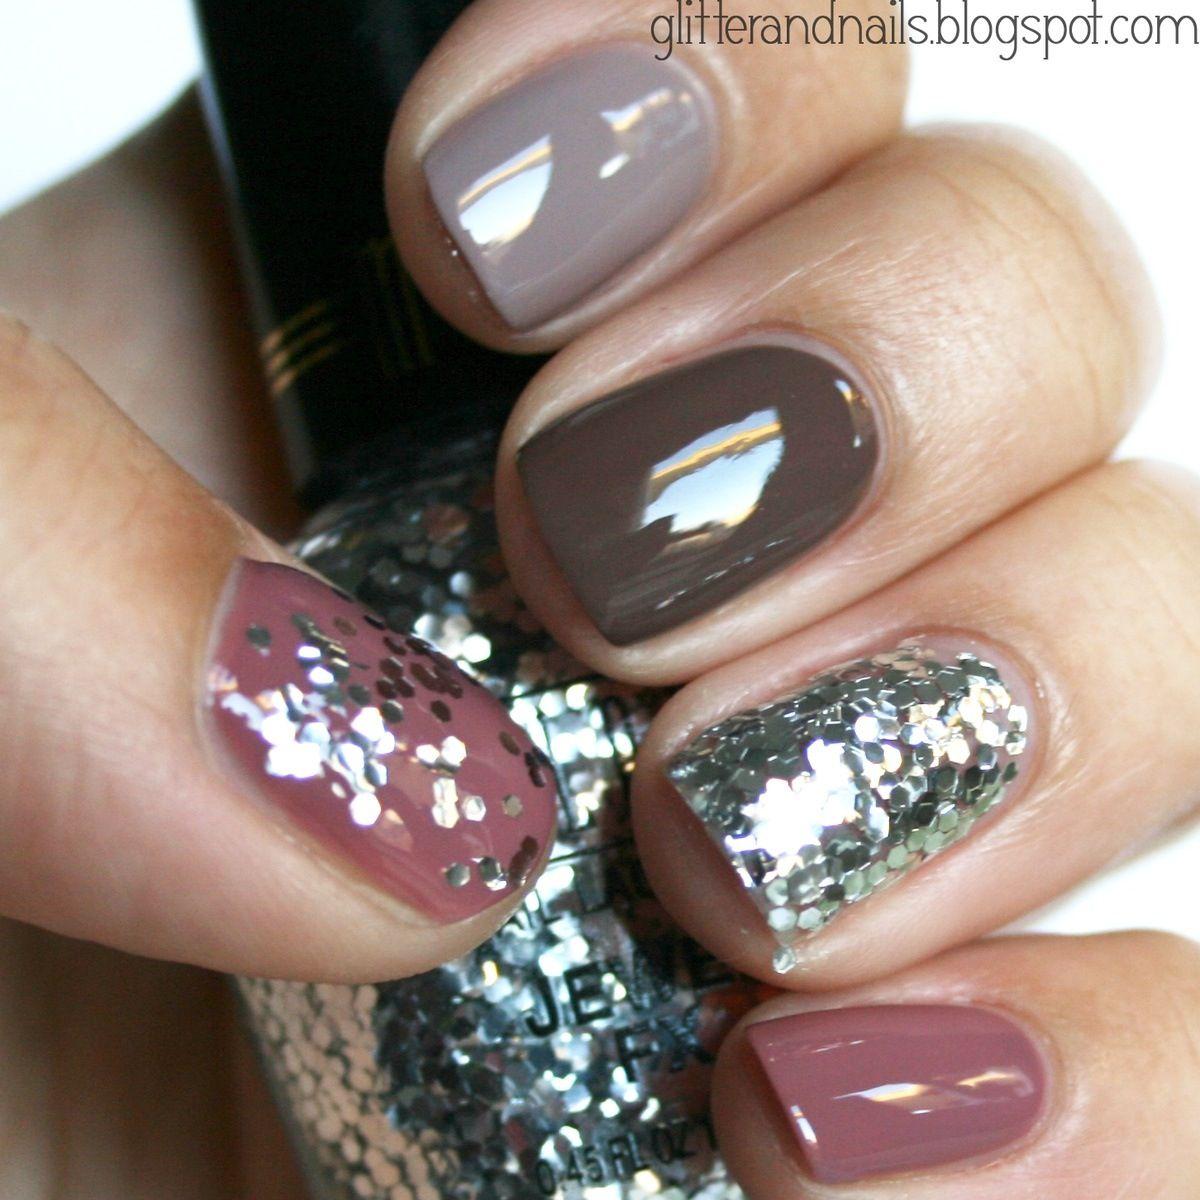 Nails Autumn: Pretty Fall Nails